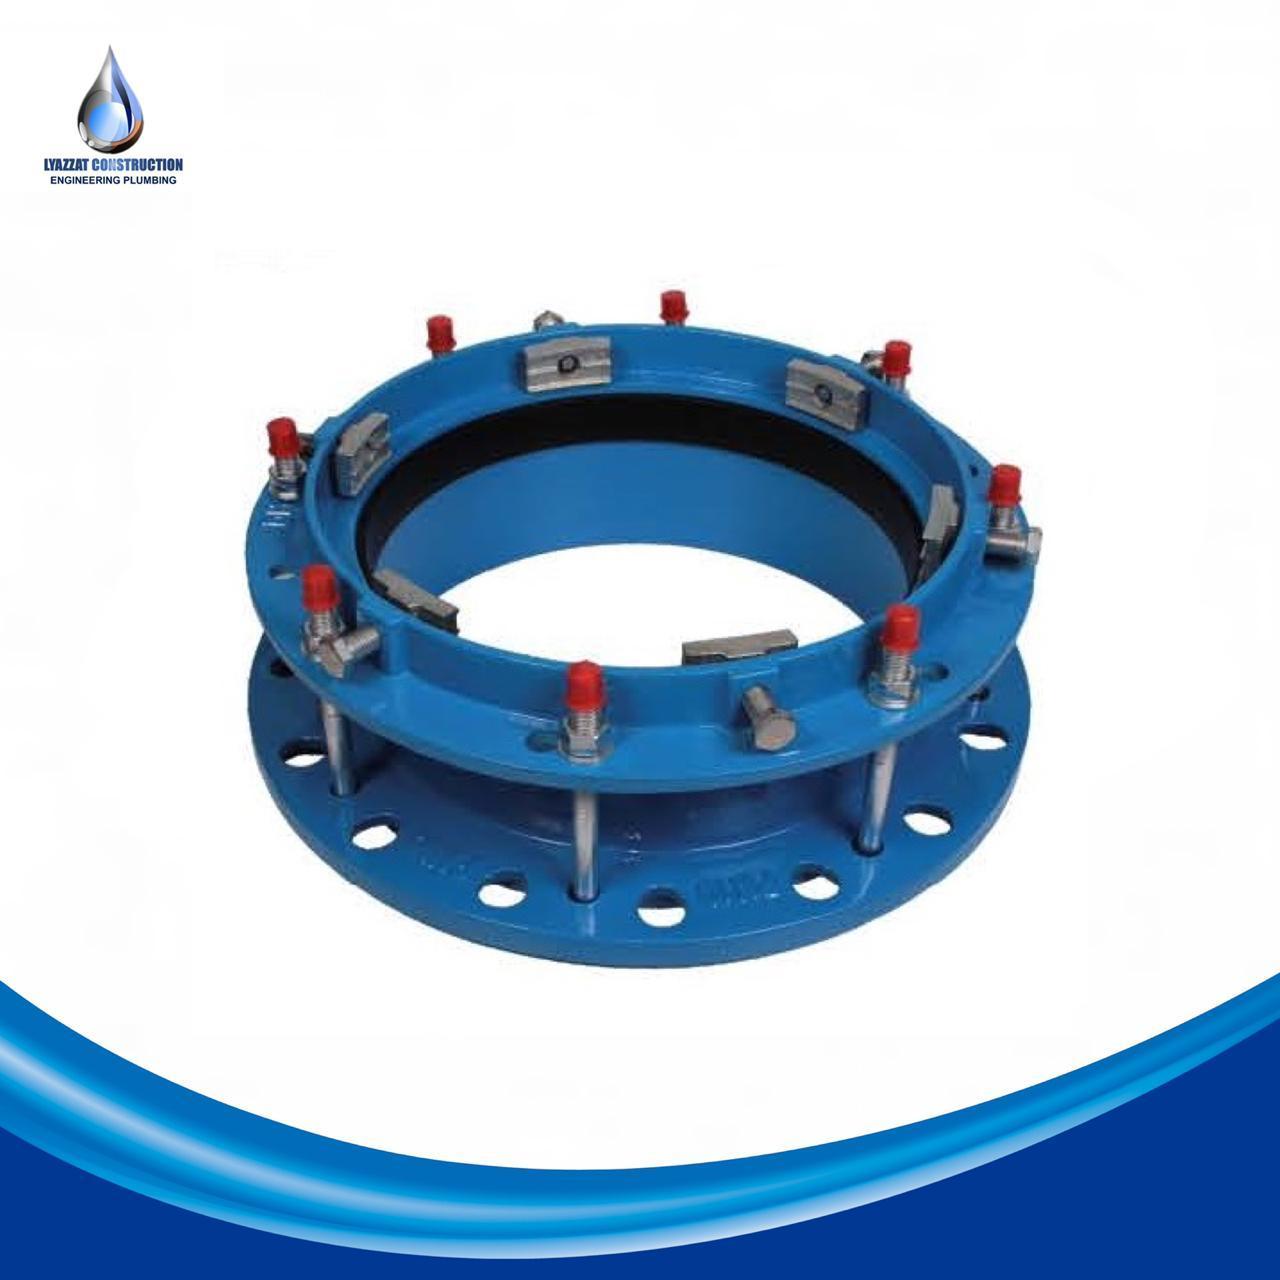 Фланец фиксирующий для ПЭ и ПВХ труб DN 400/450 PN10-16